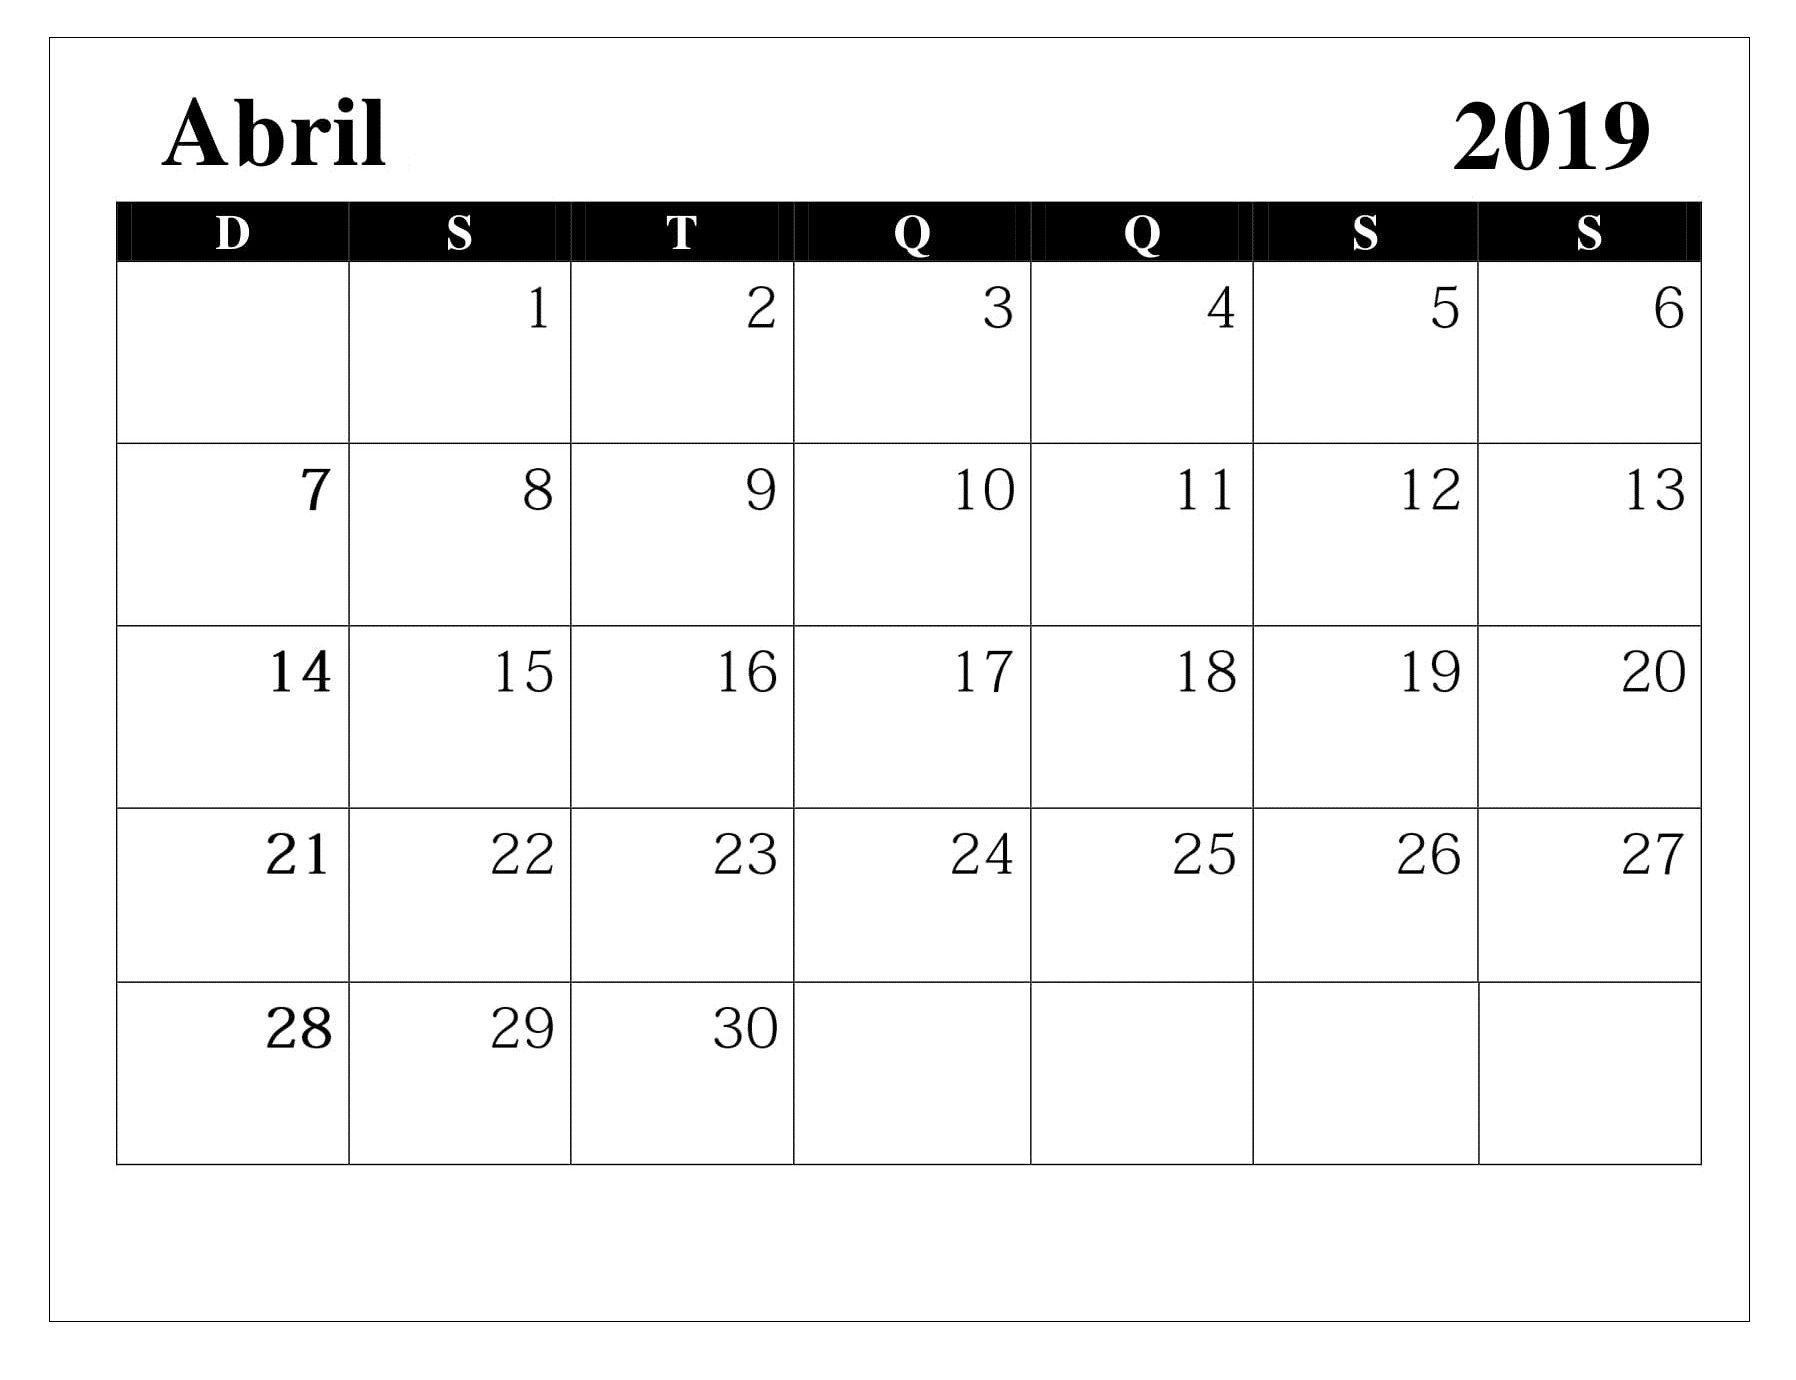 Calendario 2o19.Calendario 2019 Abril Calendario Abril 2019 Imprimir